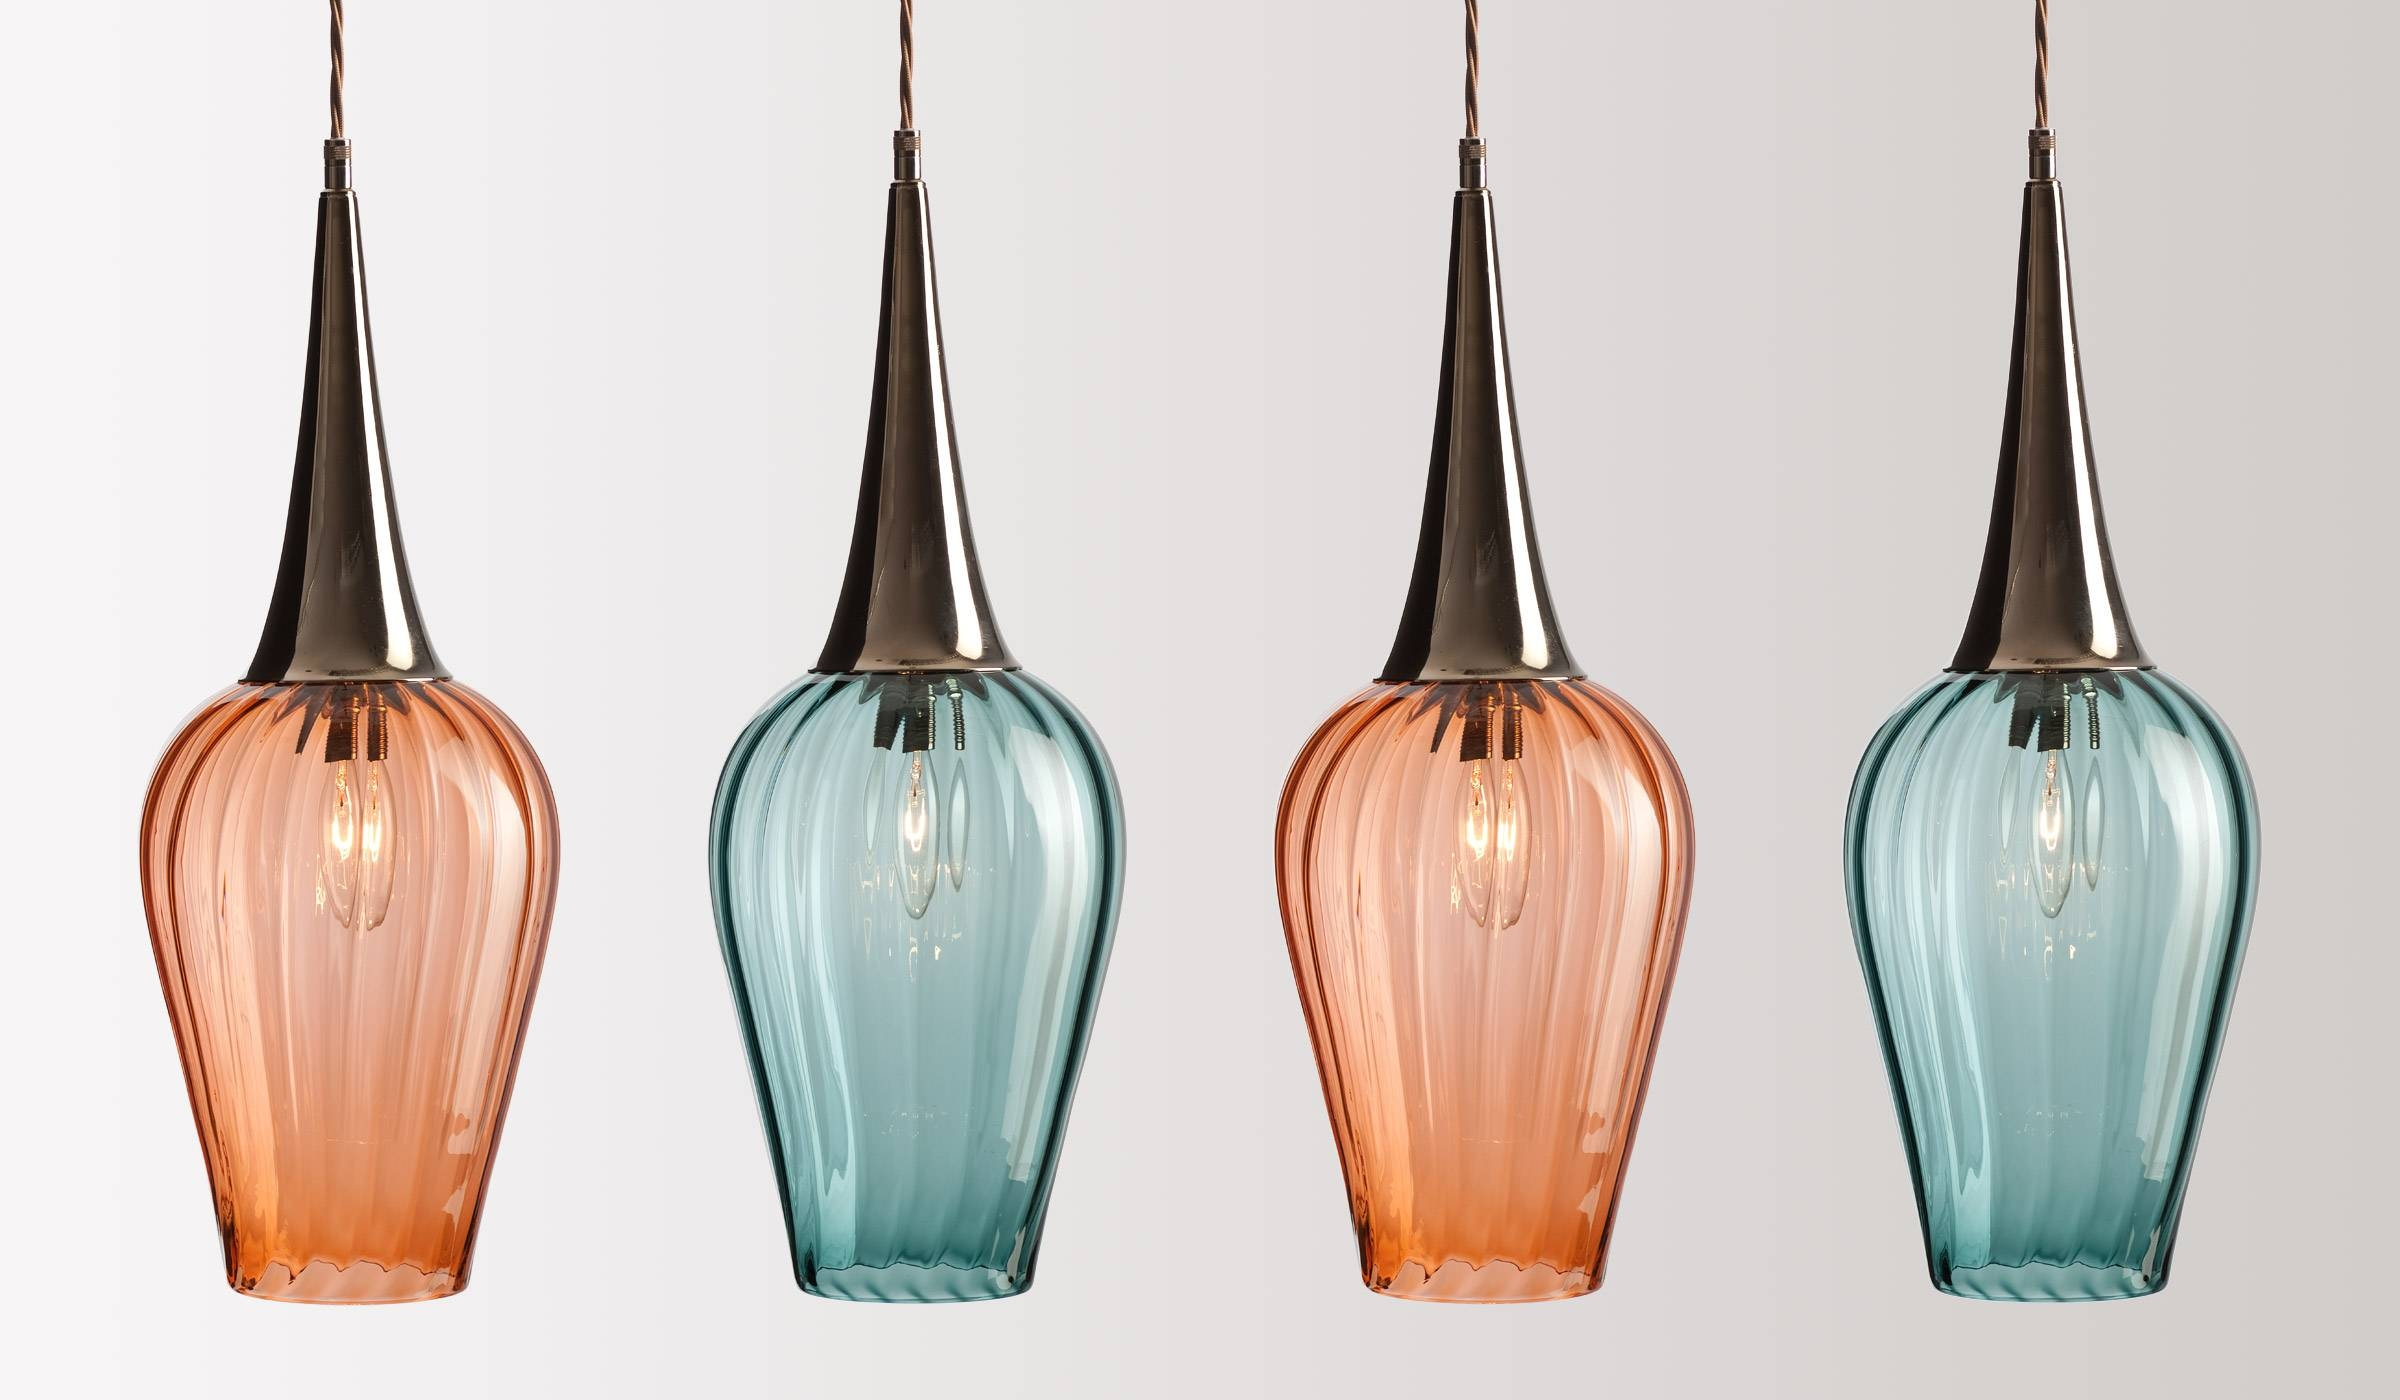 Glass Lighting - Rothschild & Bickers regarding Coloured Glass Pendant Lights (Image 6 of 15)